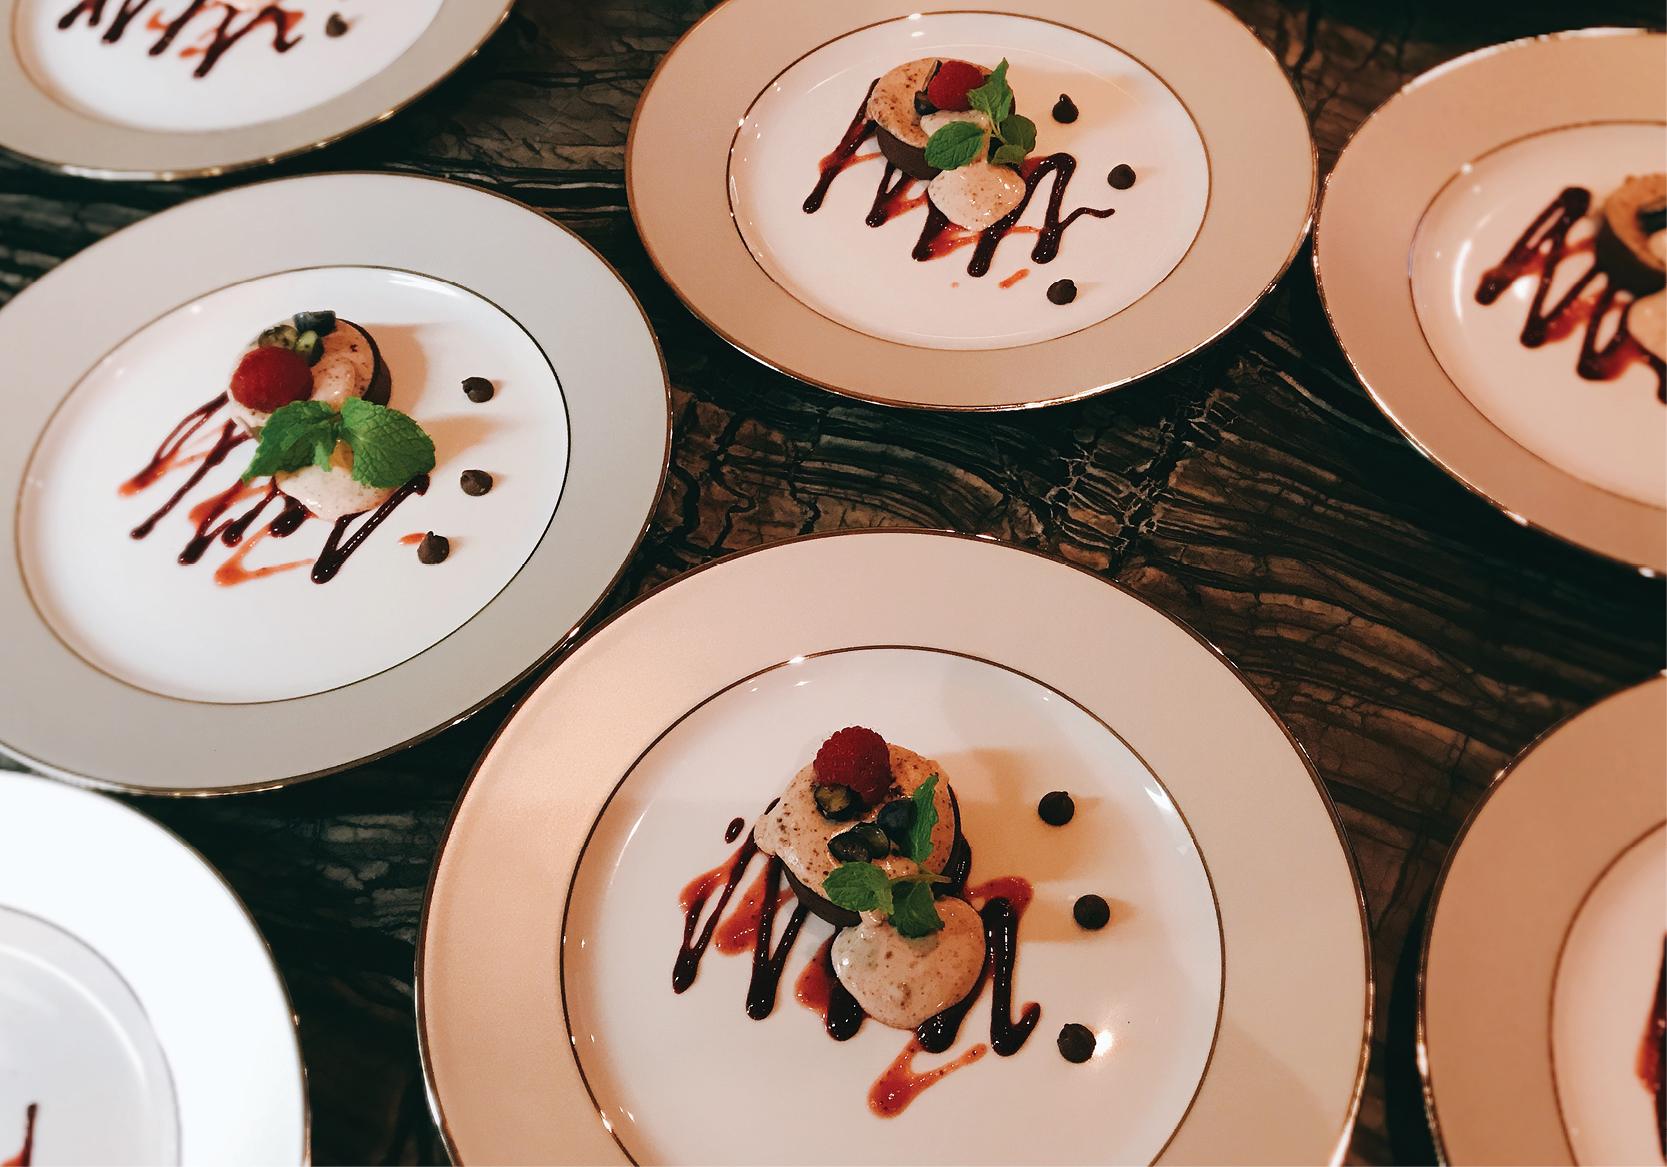 Vanilla and Chocolate Crumb Cheesecake with Blueberries